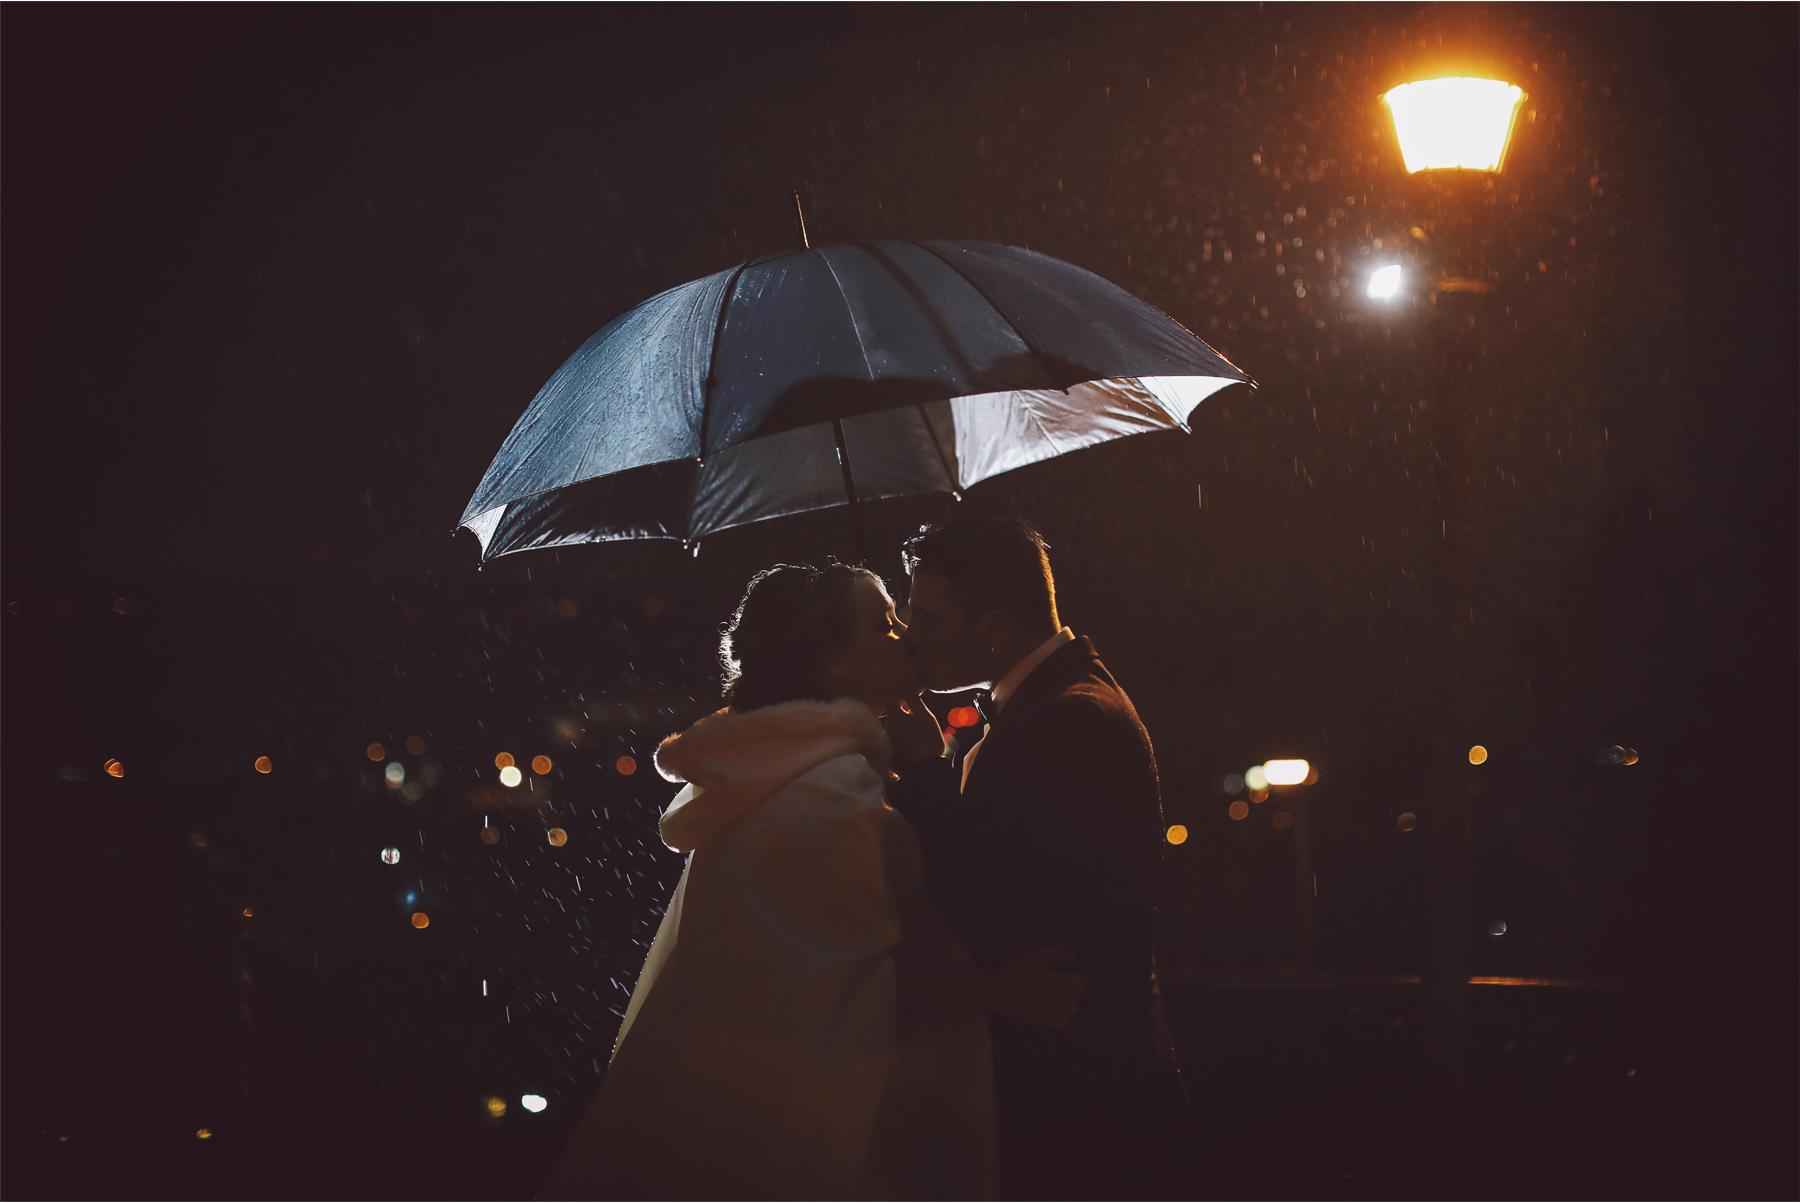 14-Saint-Paul-Minnesota-Wedding-Photography-by-Vick-Photography-The-University-Club-Night-Photography-Rain-Umbrella-Mari-and-Giuseppe.jpg